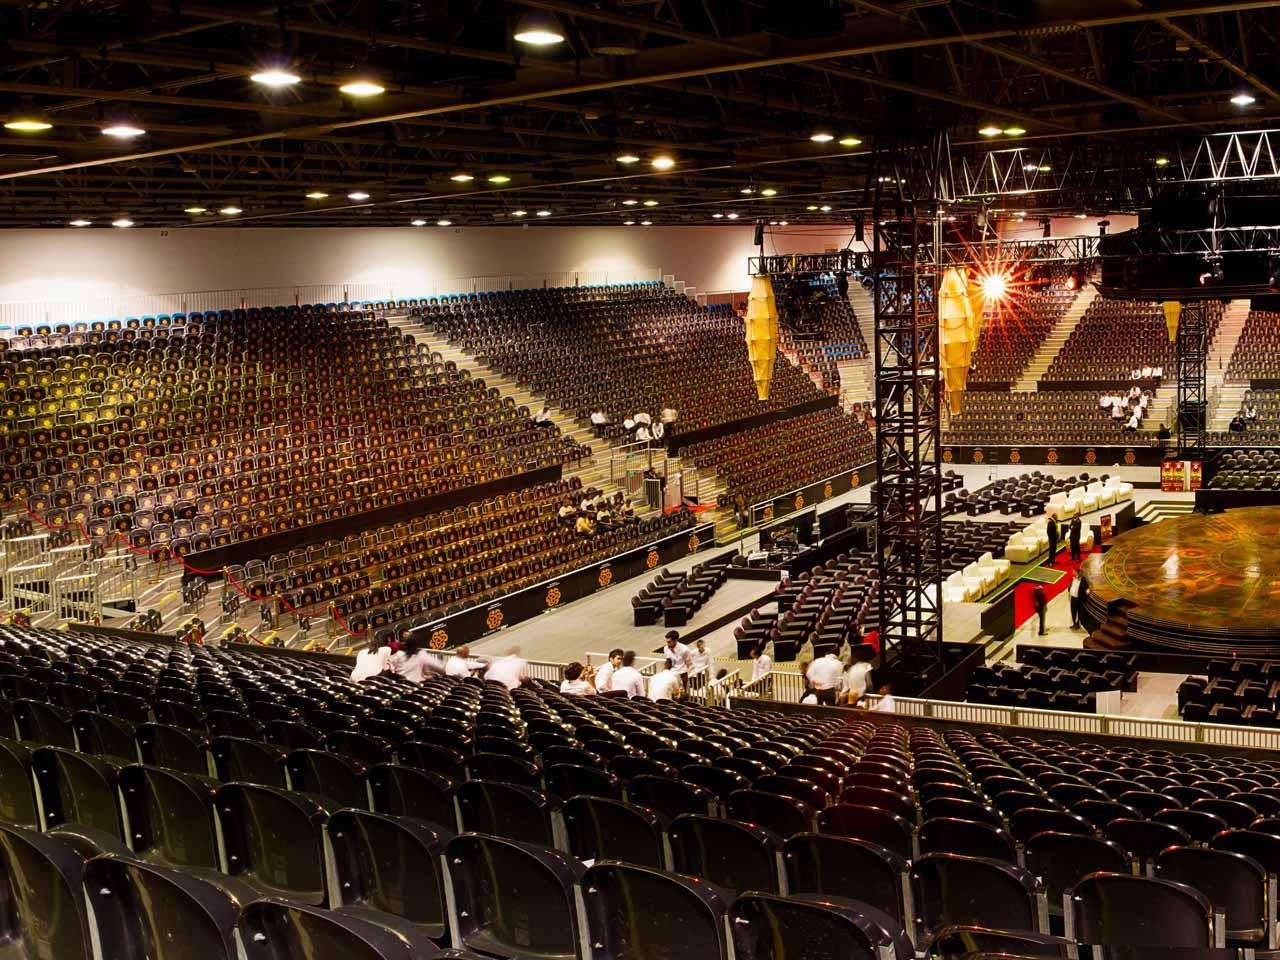 grandstand-seats-events-setup-rental-stadium-seating-sport-management-film-festival-seating-screening-f1-open-air-cinema-12